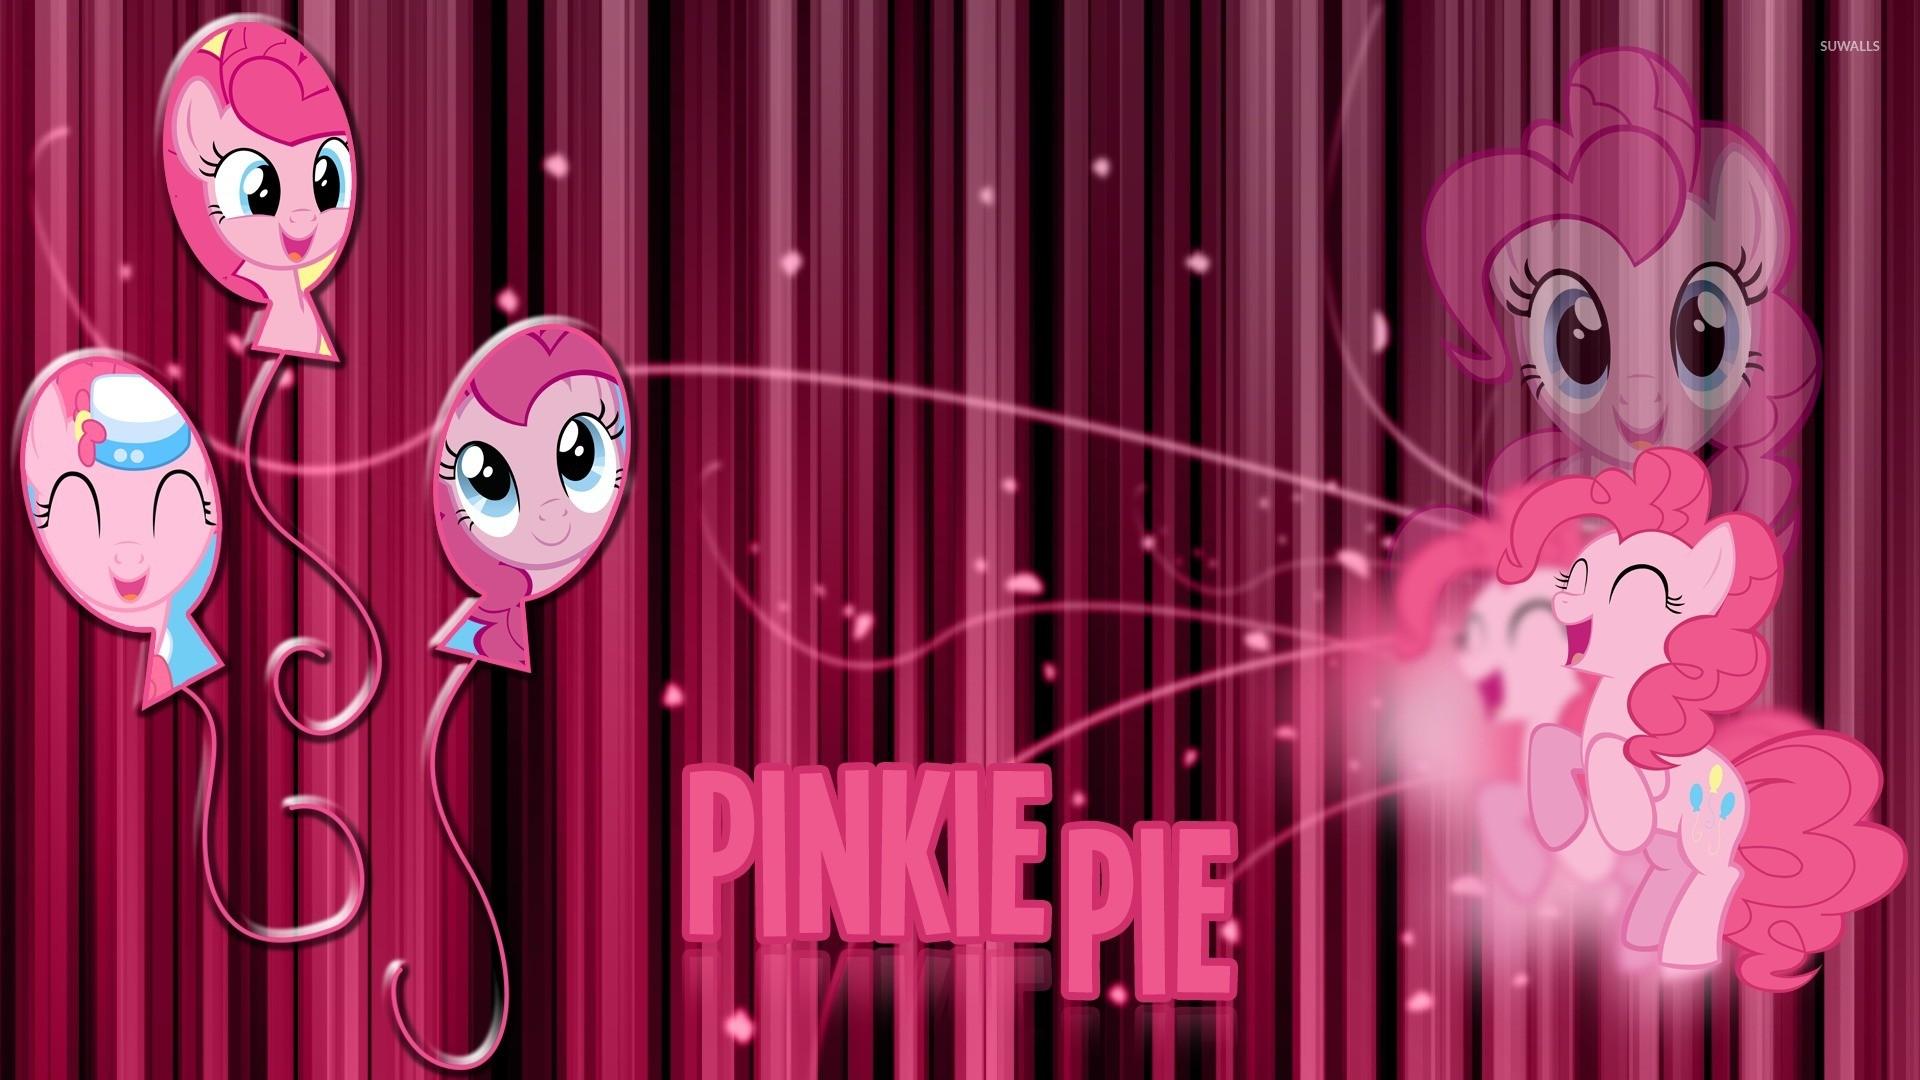 Pinkie Pie different poses – My Little Pony wallpaper jpg